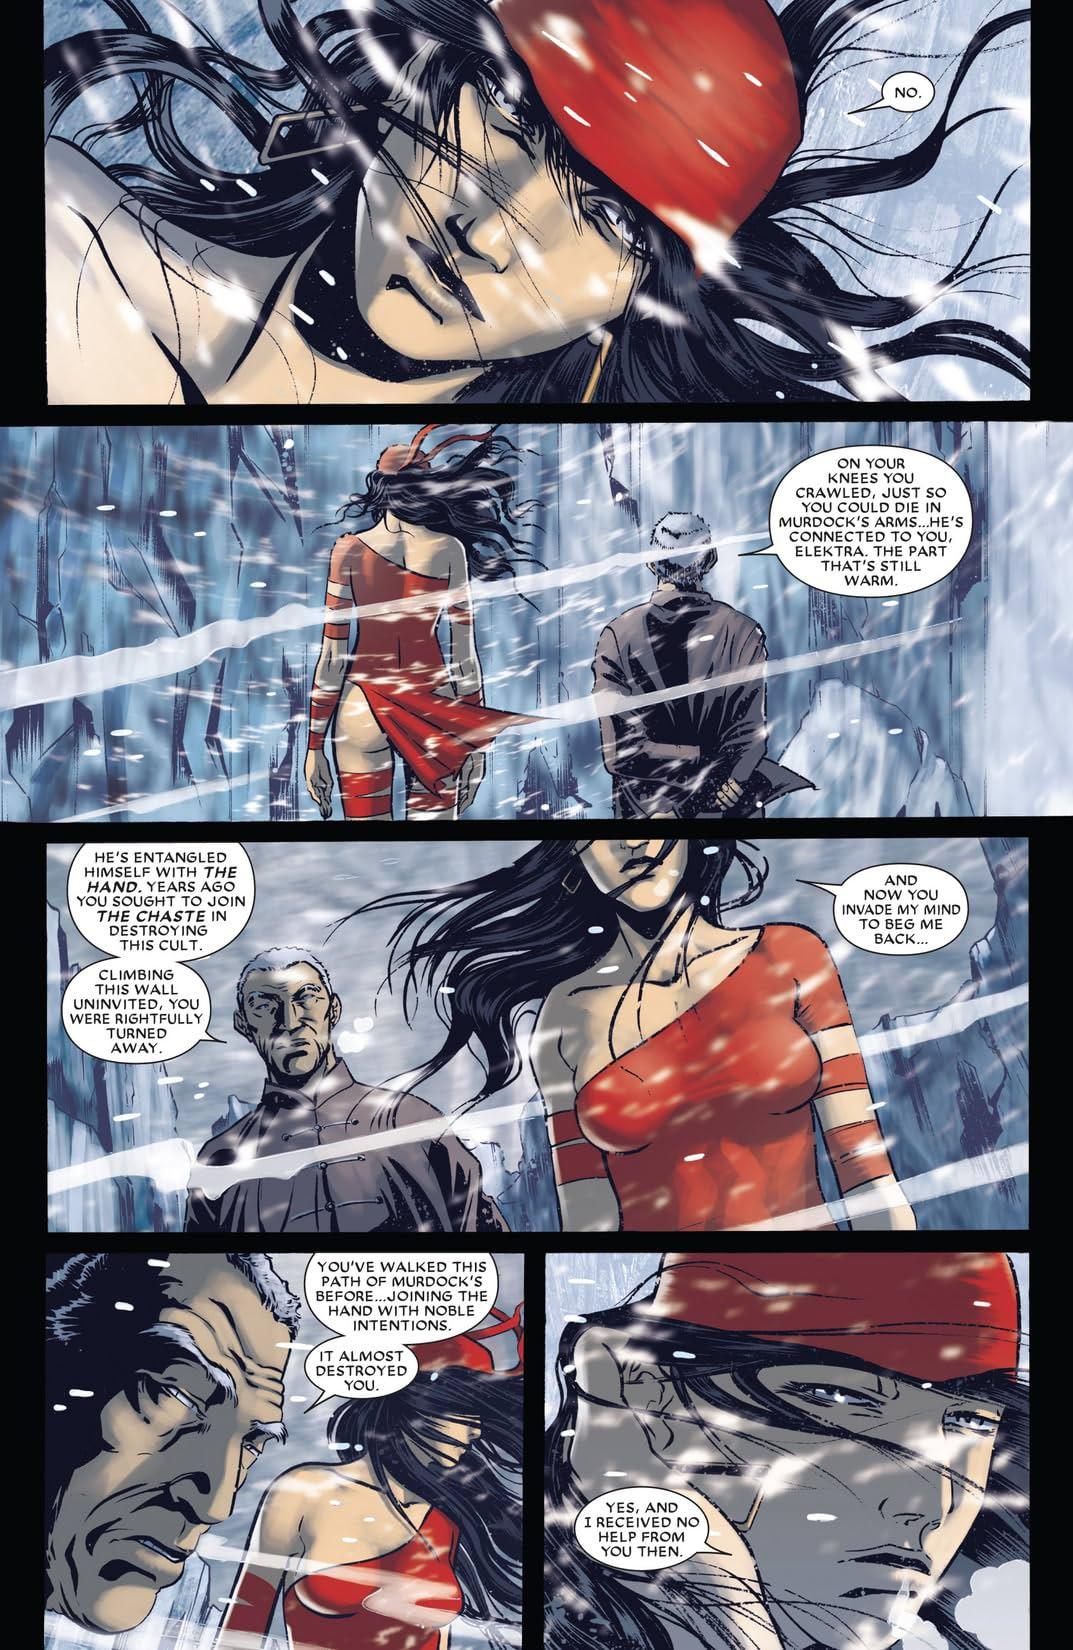 Shadowland: Elektra #1